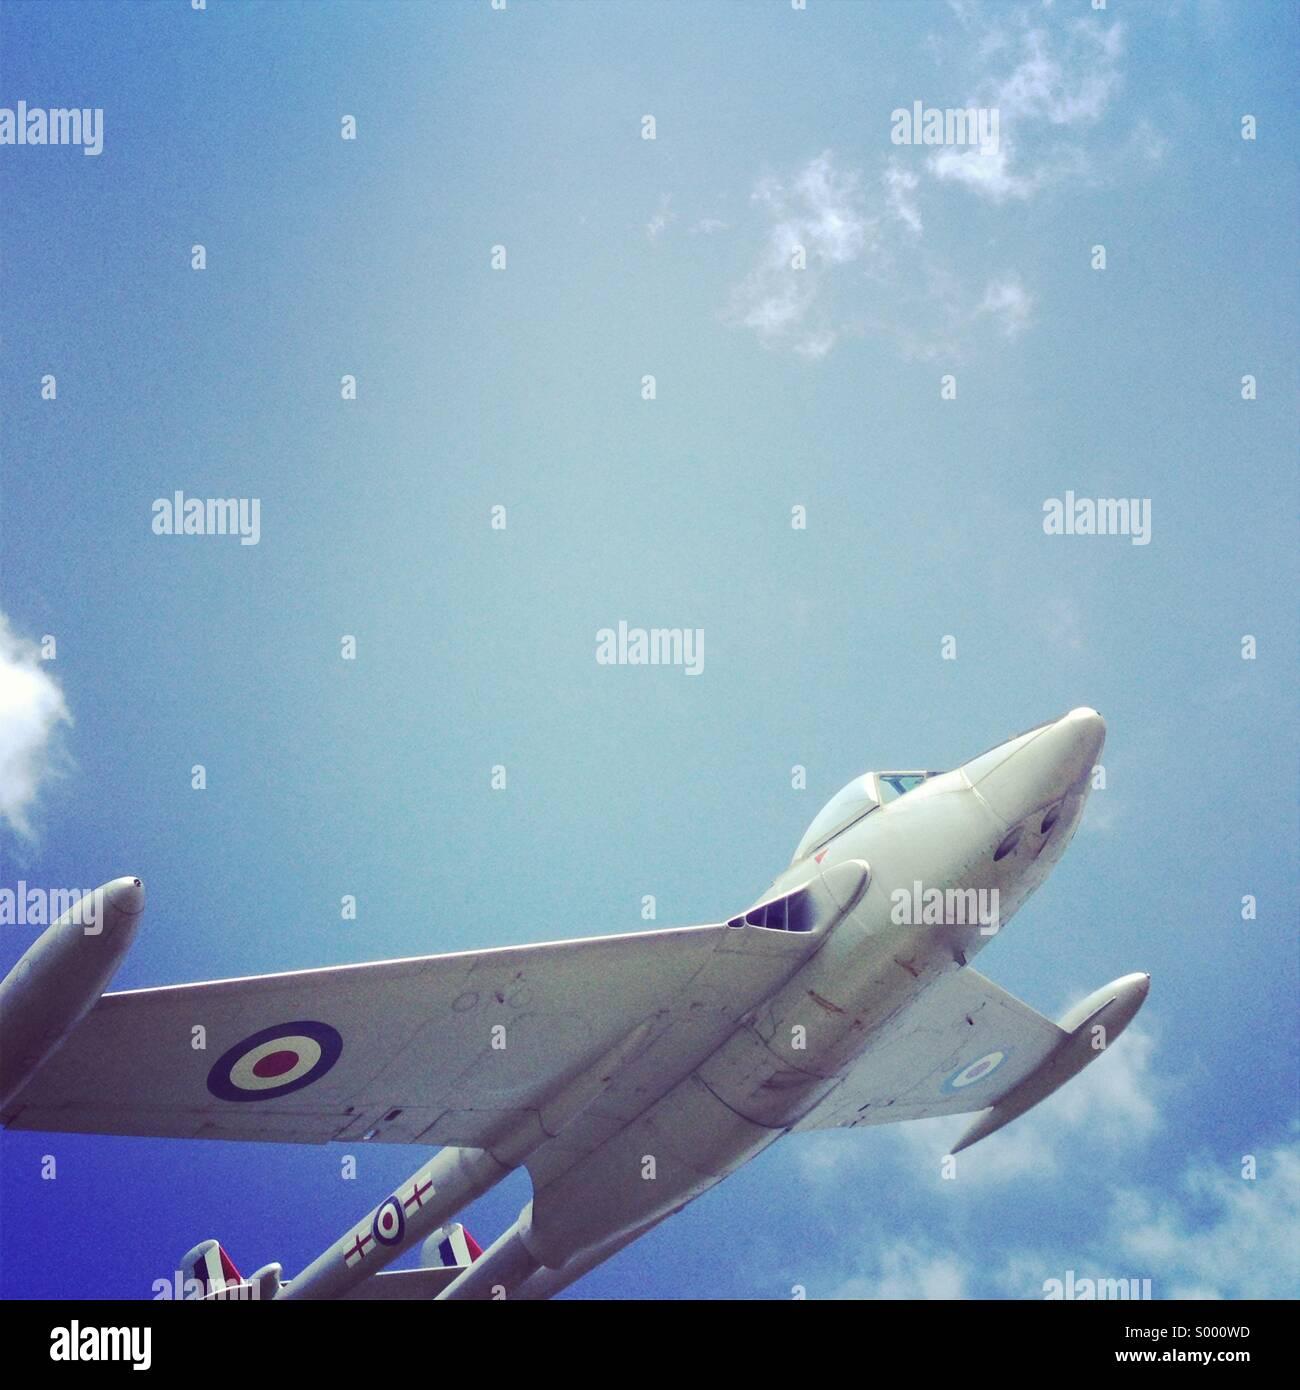 DH venom aeroplane at grove airfield, Wantage, Oxfordshire UK. - Stock Image